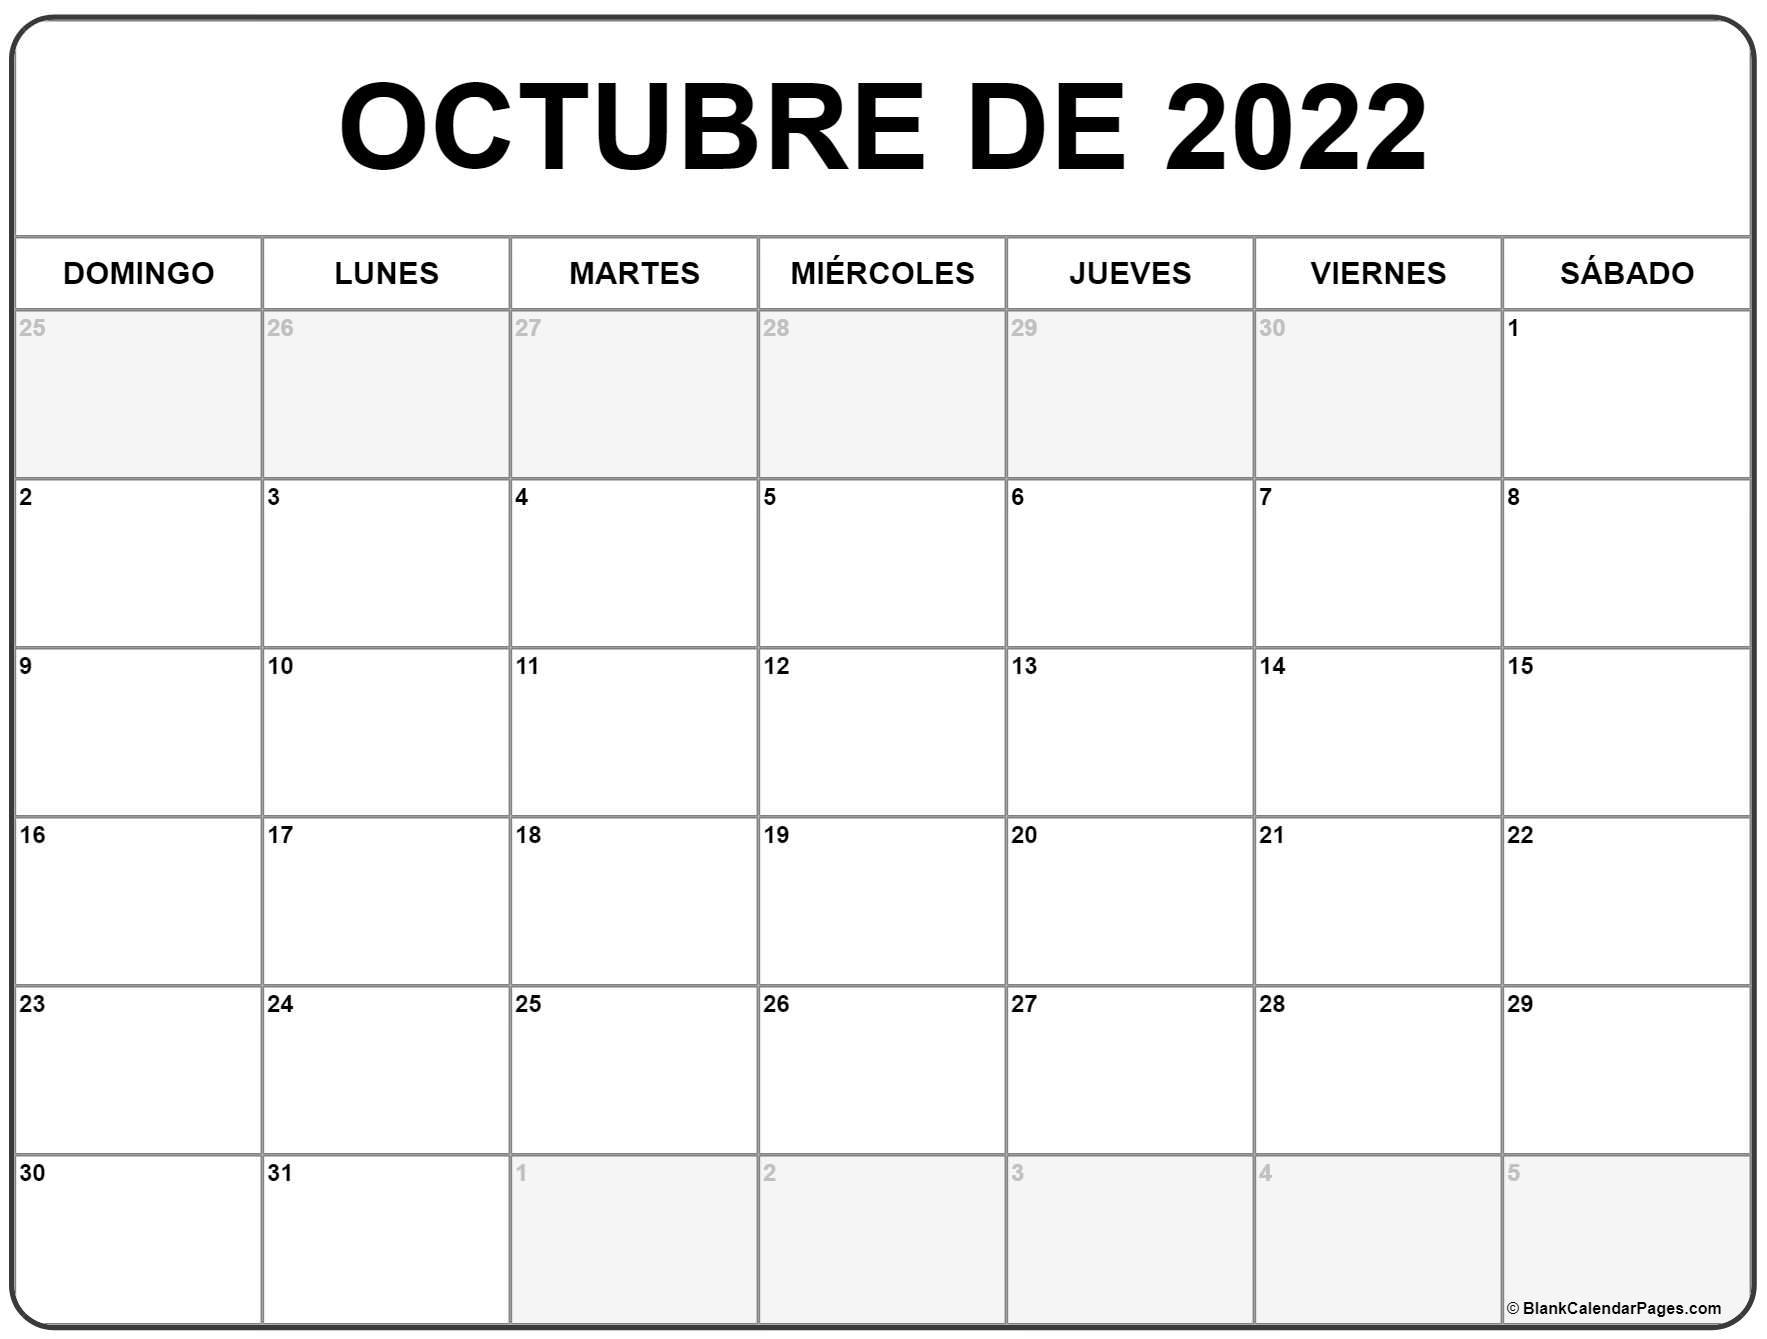 octubre de 2022 calendrario